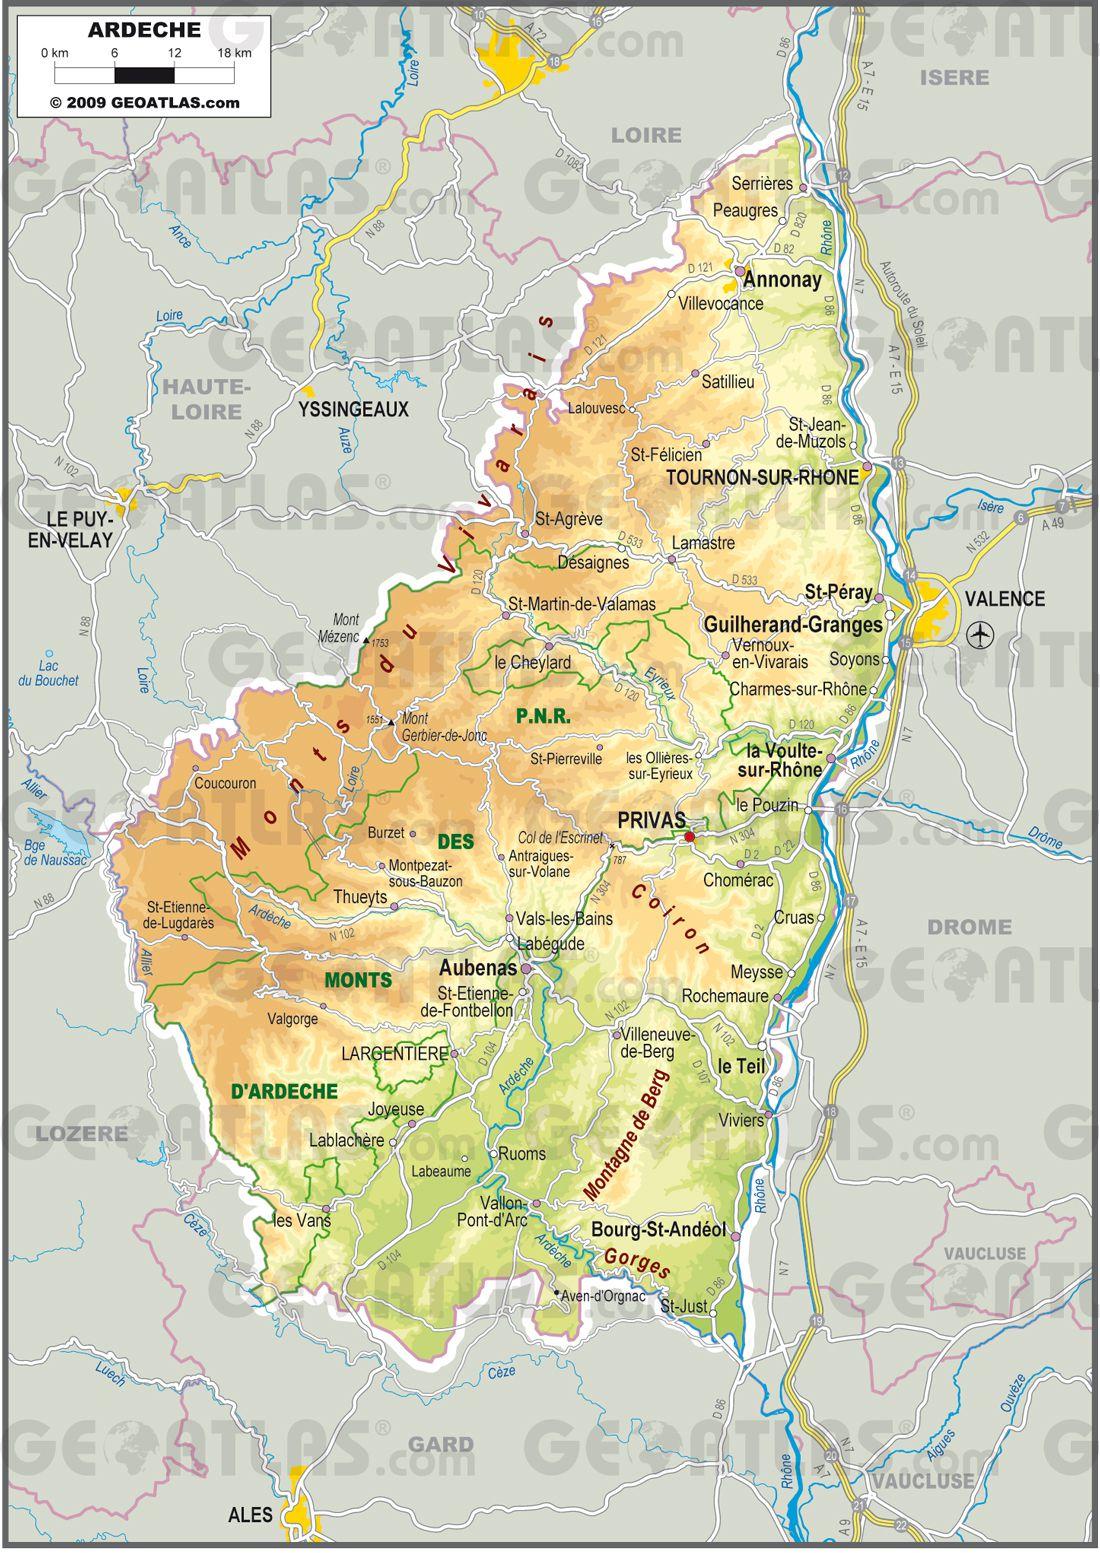 Ardèche carte